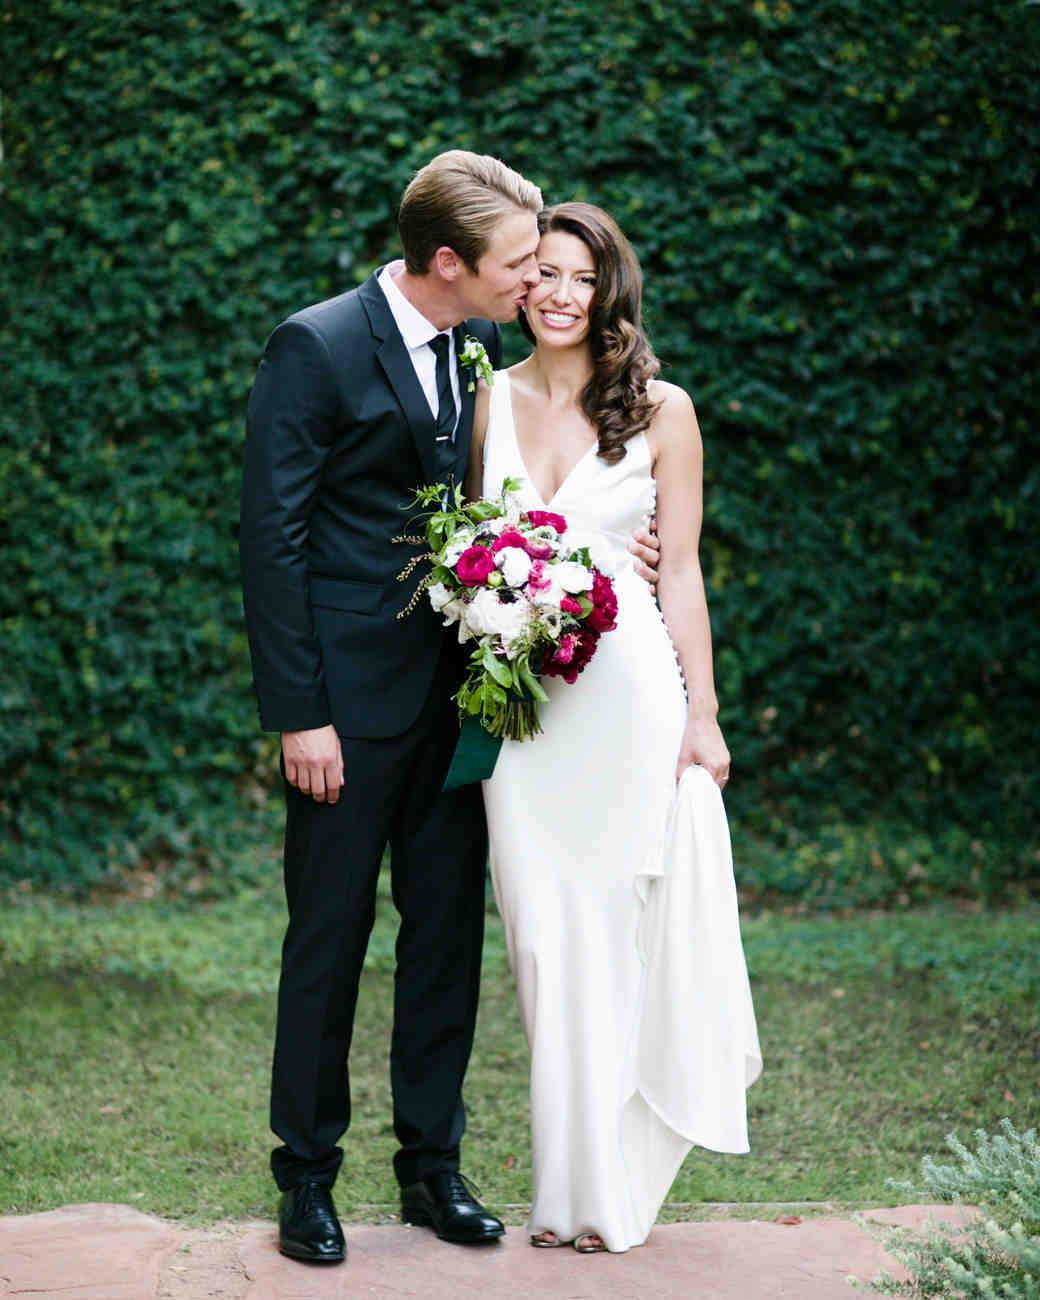 kelly_mike-wedding-portrait1-0514.jpg